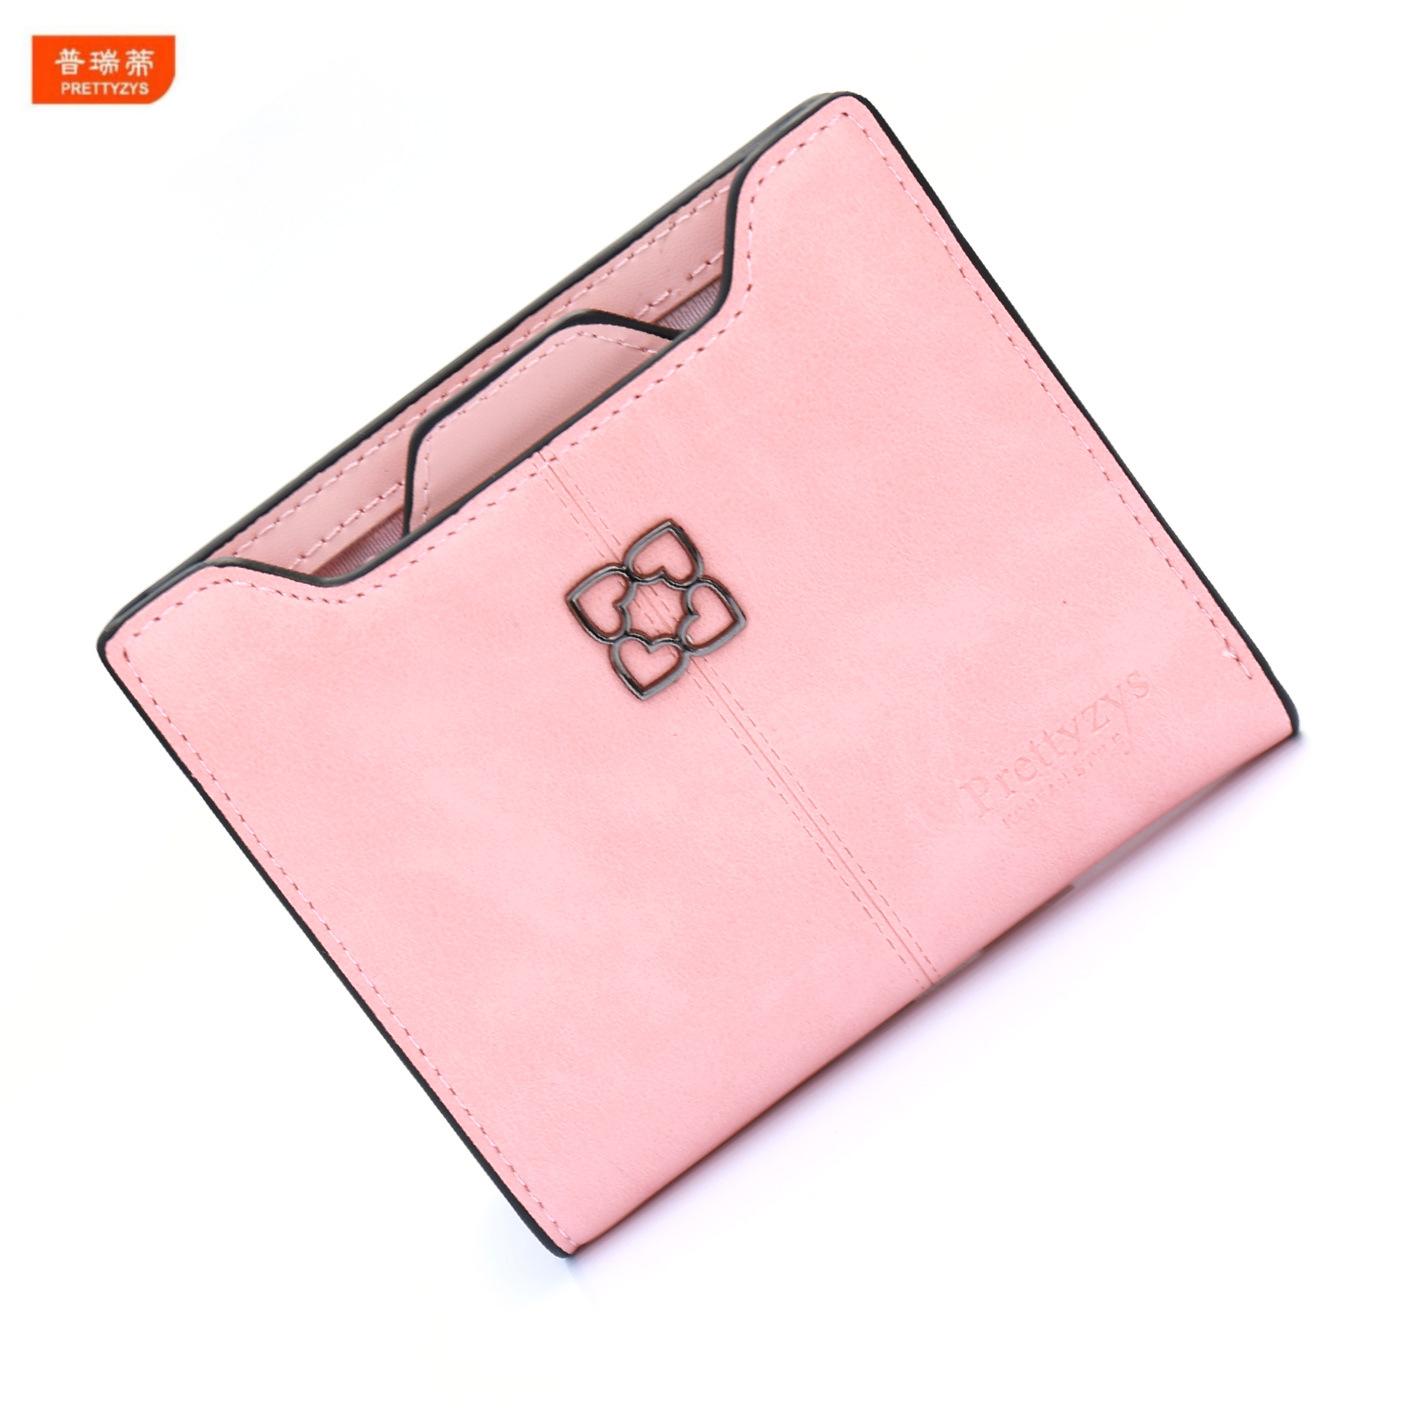 Oil PU women wallet small love heart thin wallet fashion girl purse short pattern(China (Mainland))